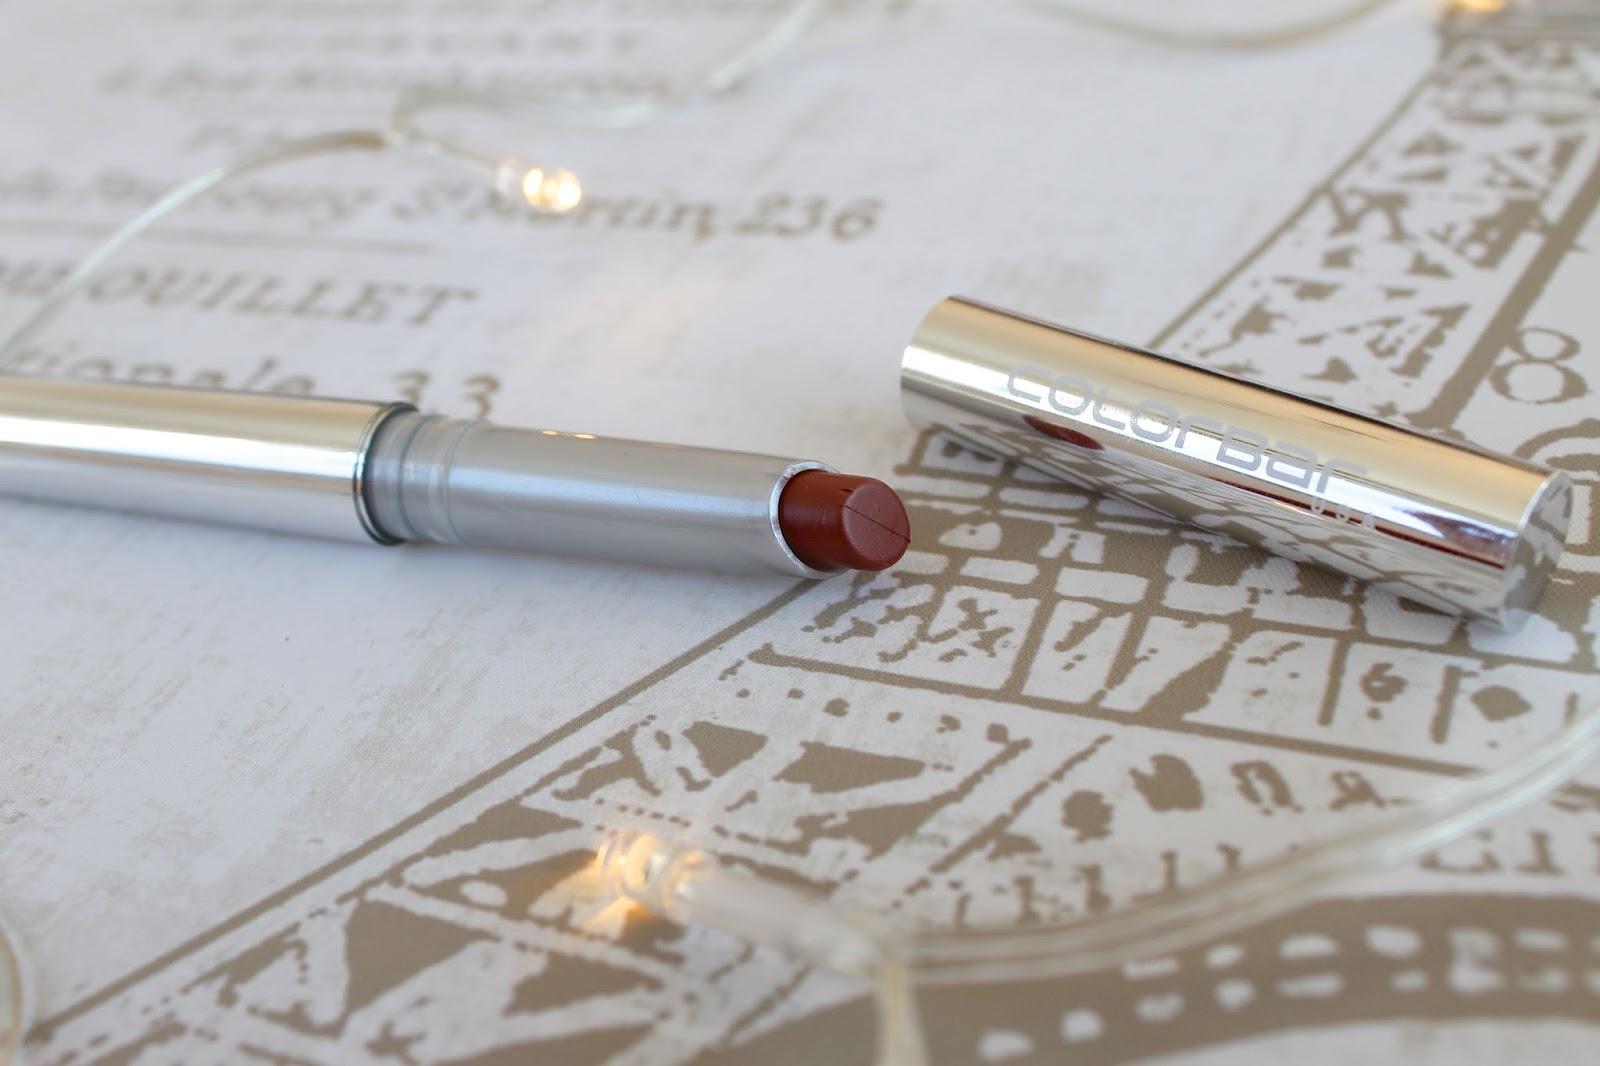 Colorbar cosmetics lipstick